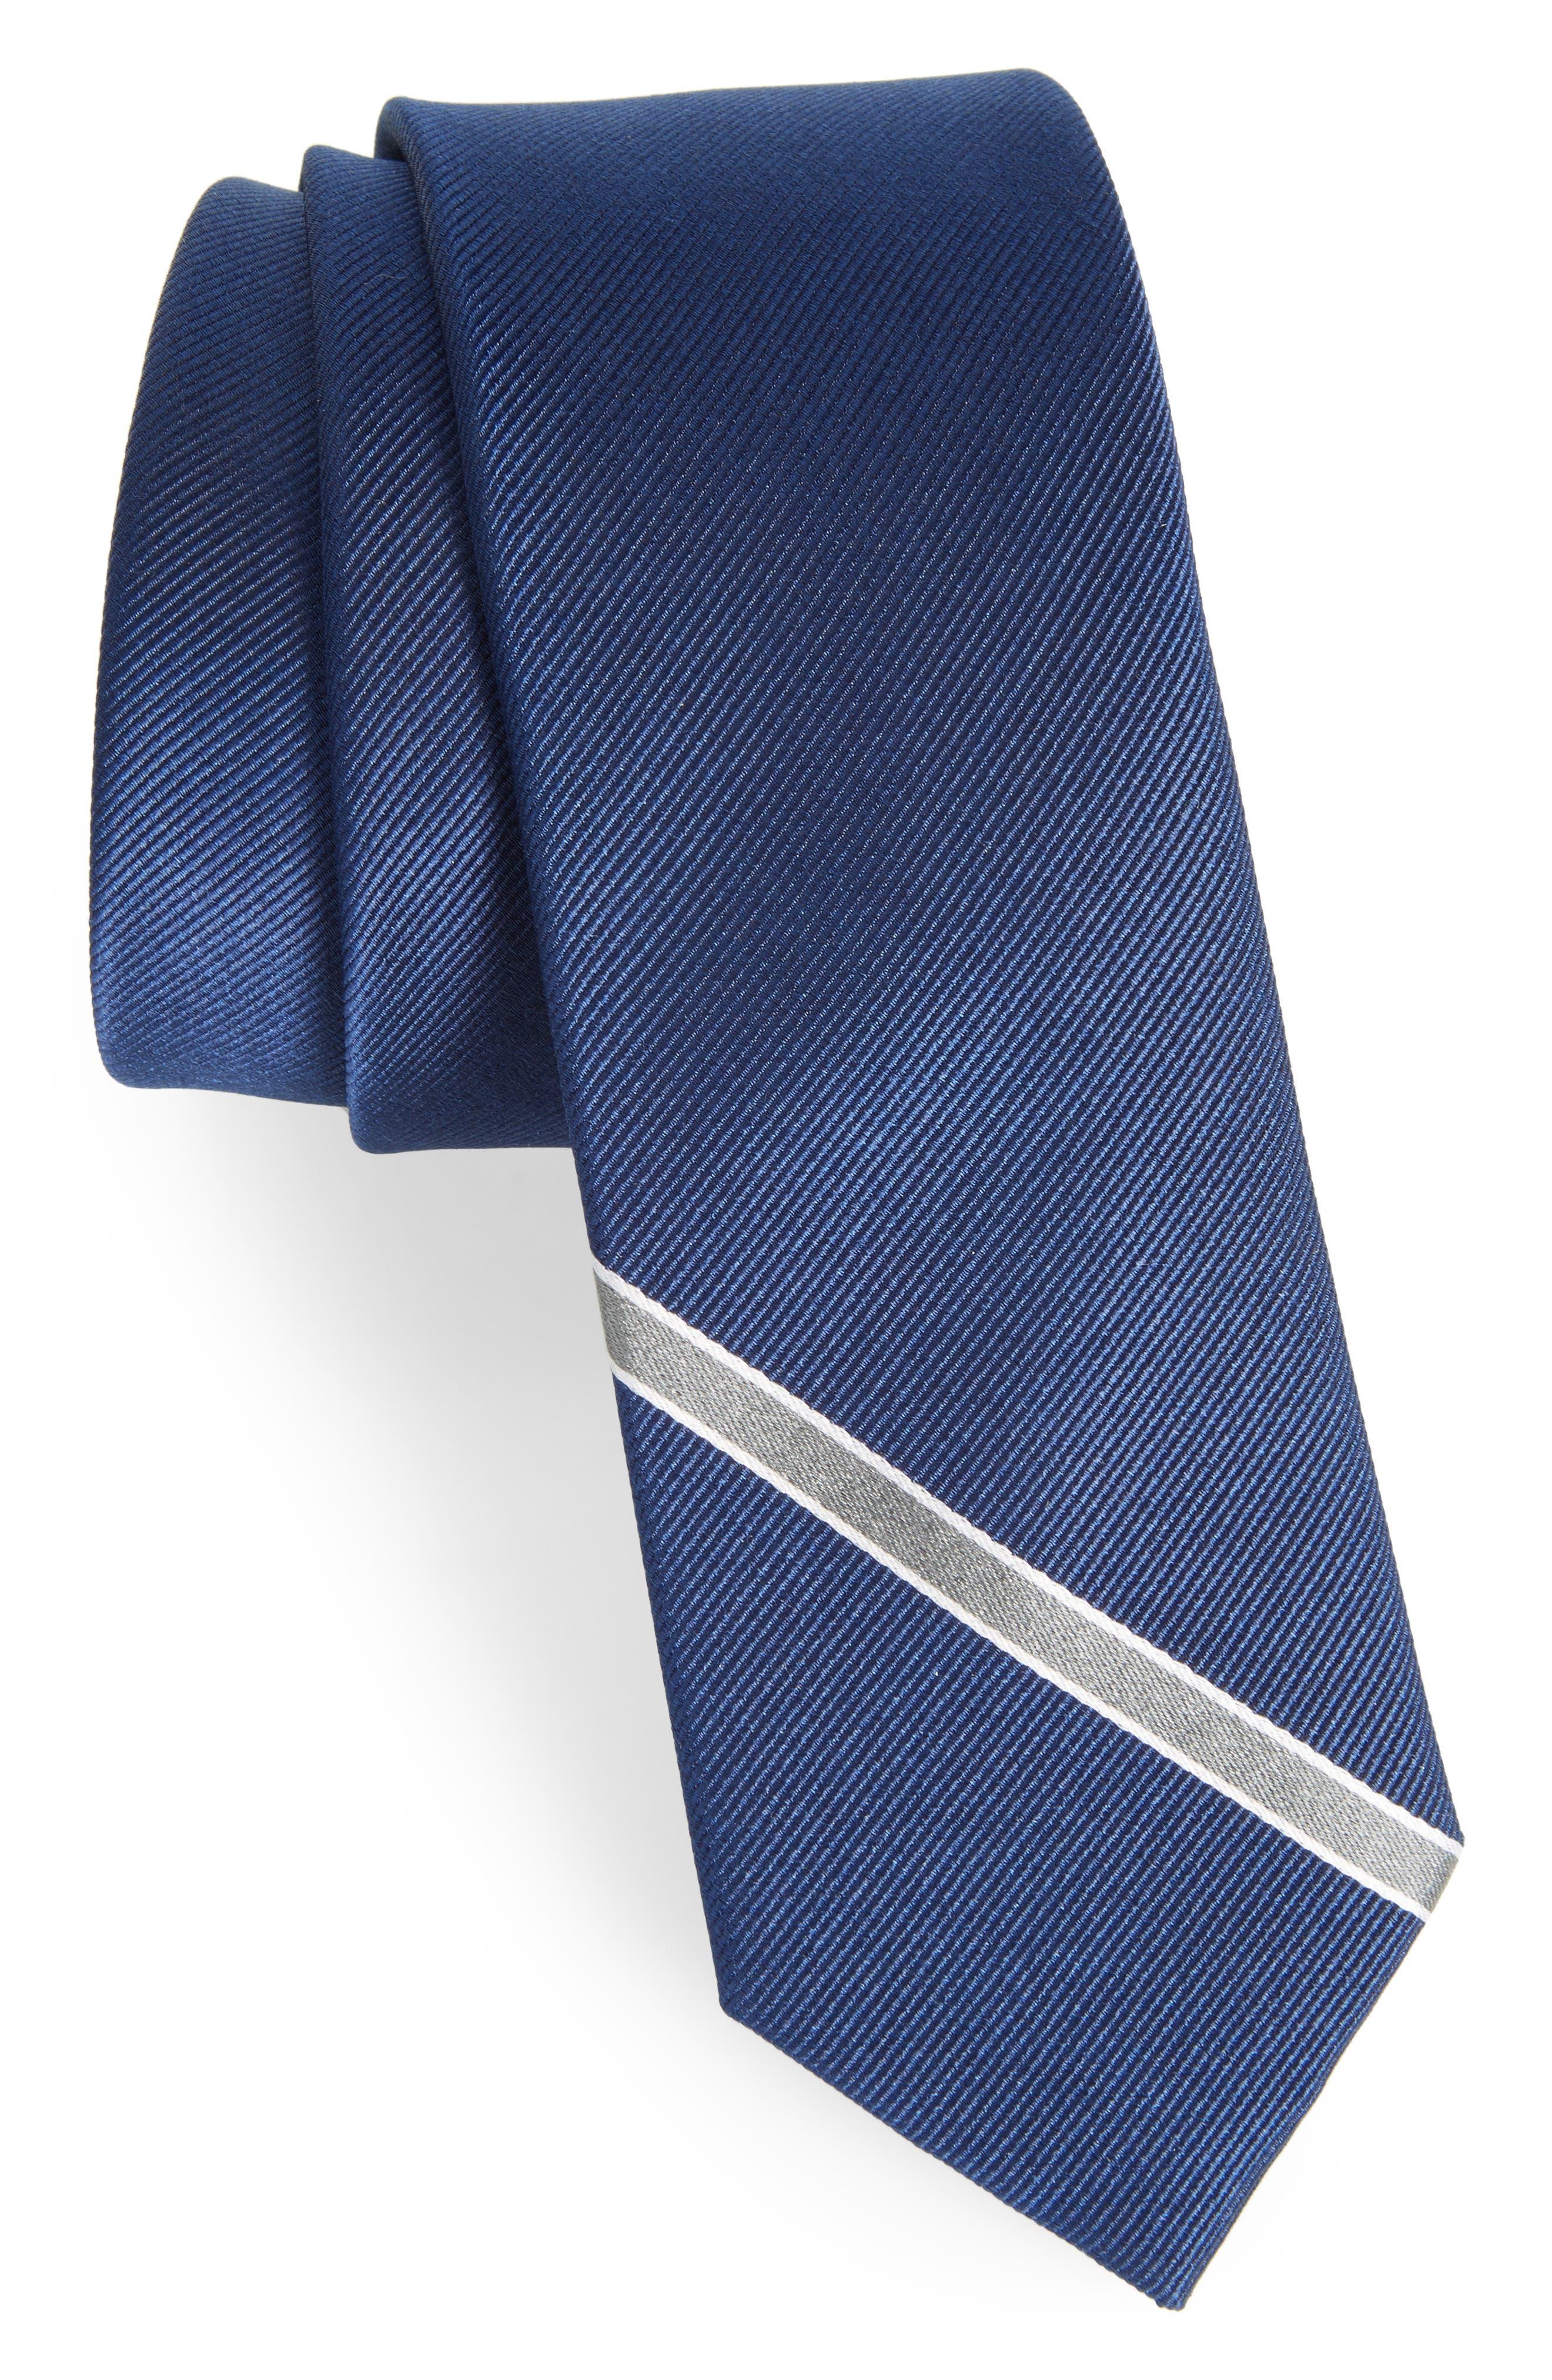 Alternate Image 1 Selected - The Tie Bar Triple Play Stripe Silk Tie